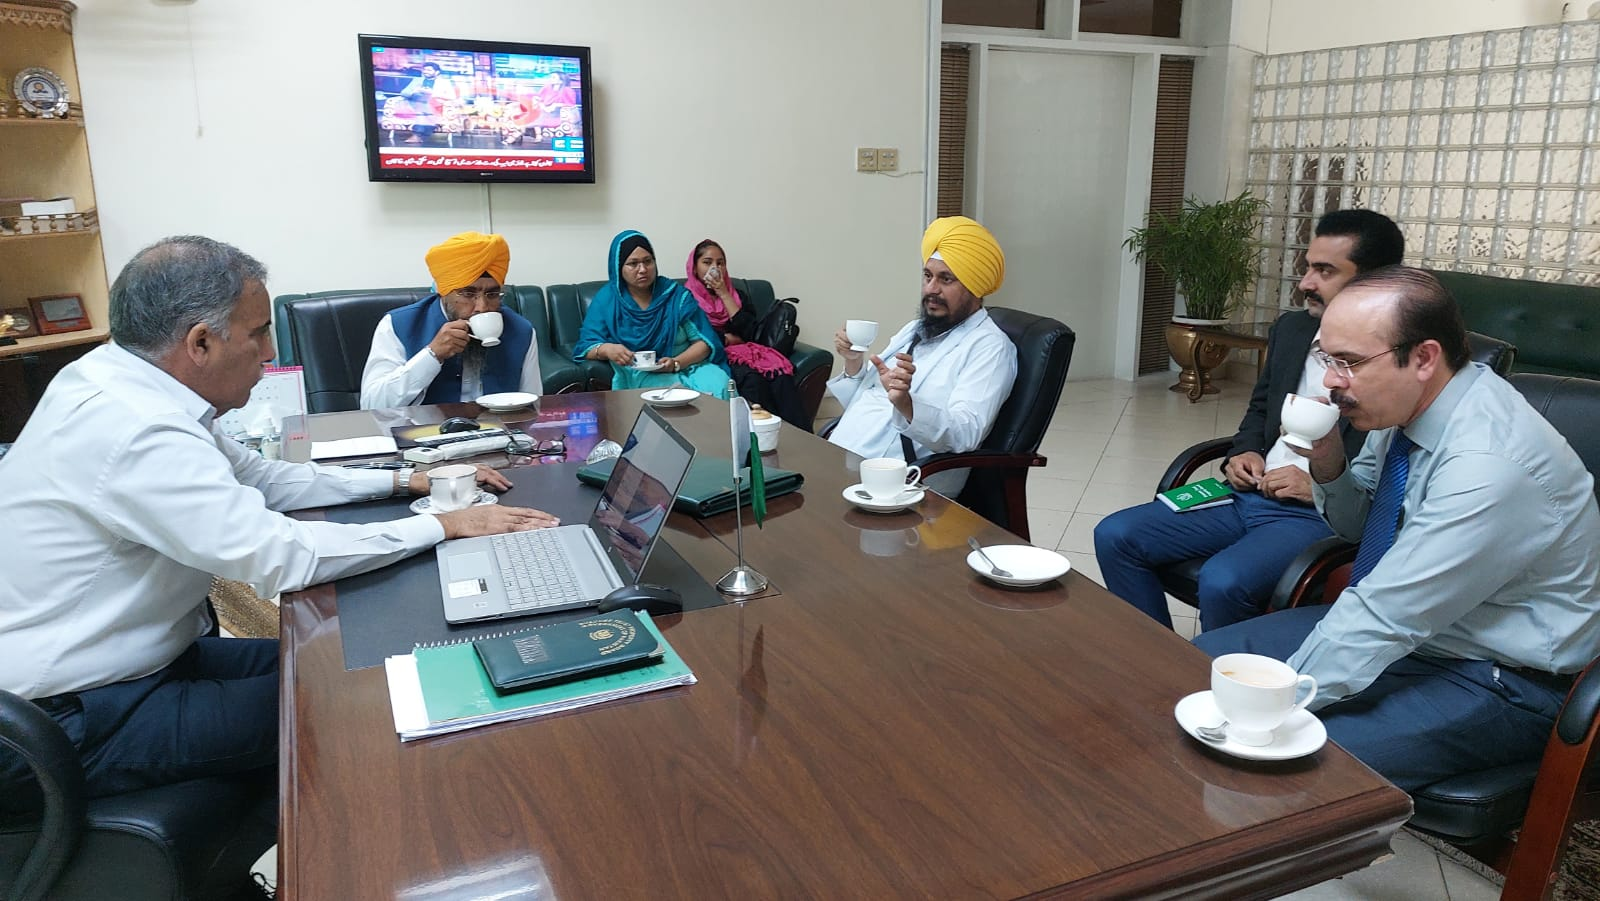 Giani Harpreet Singh Jathedar Akal Takht (Golden Temple), India met with Dr. Aamer Ahmed, Chairman ETPB